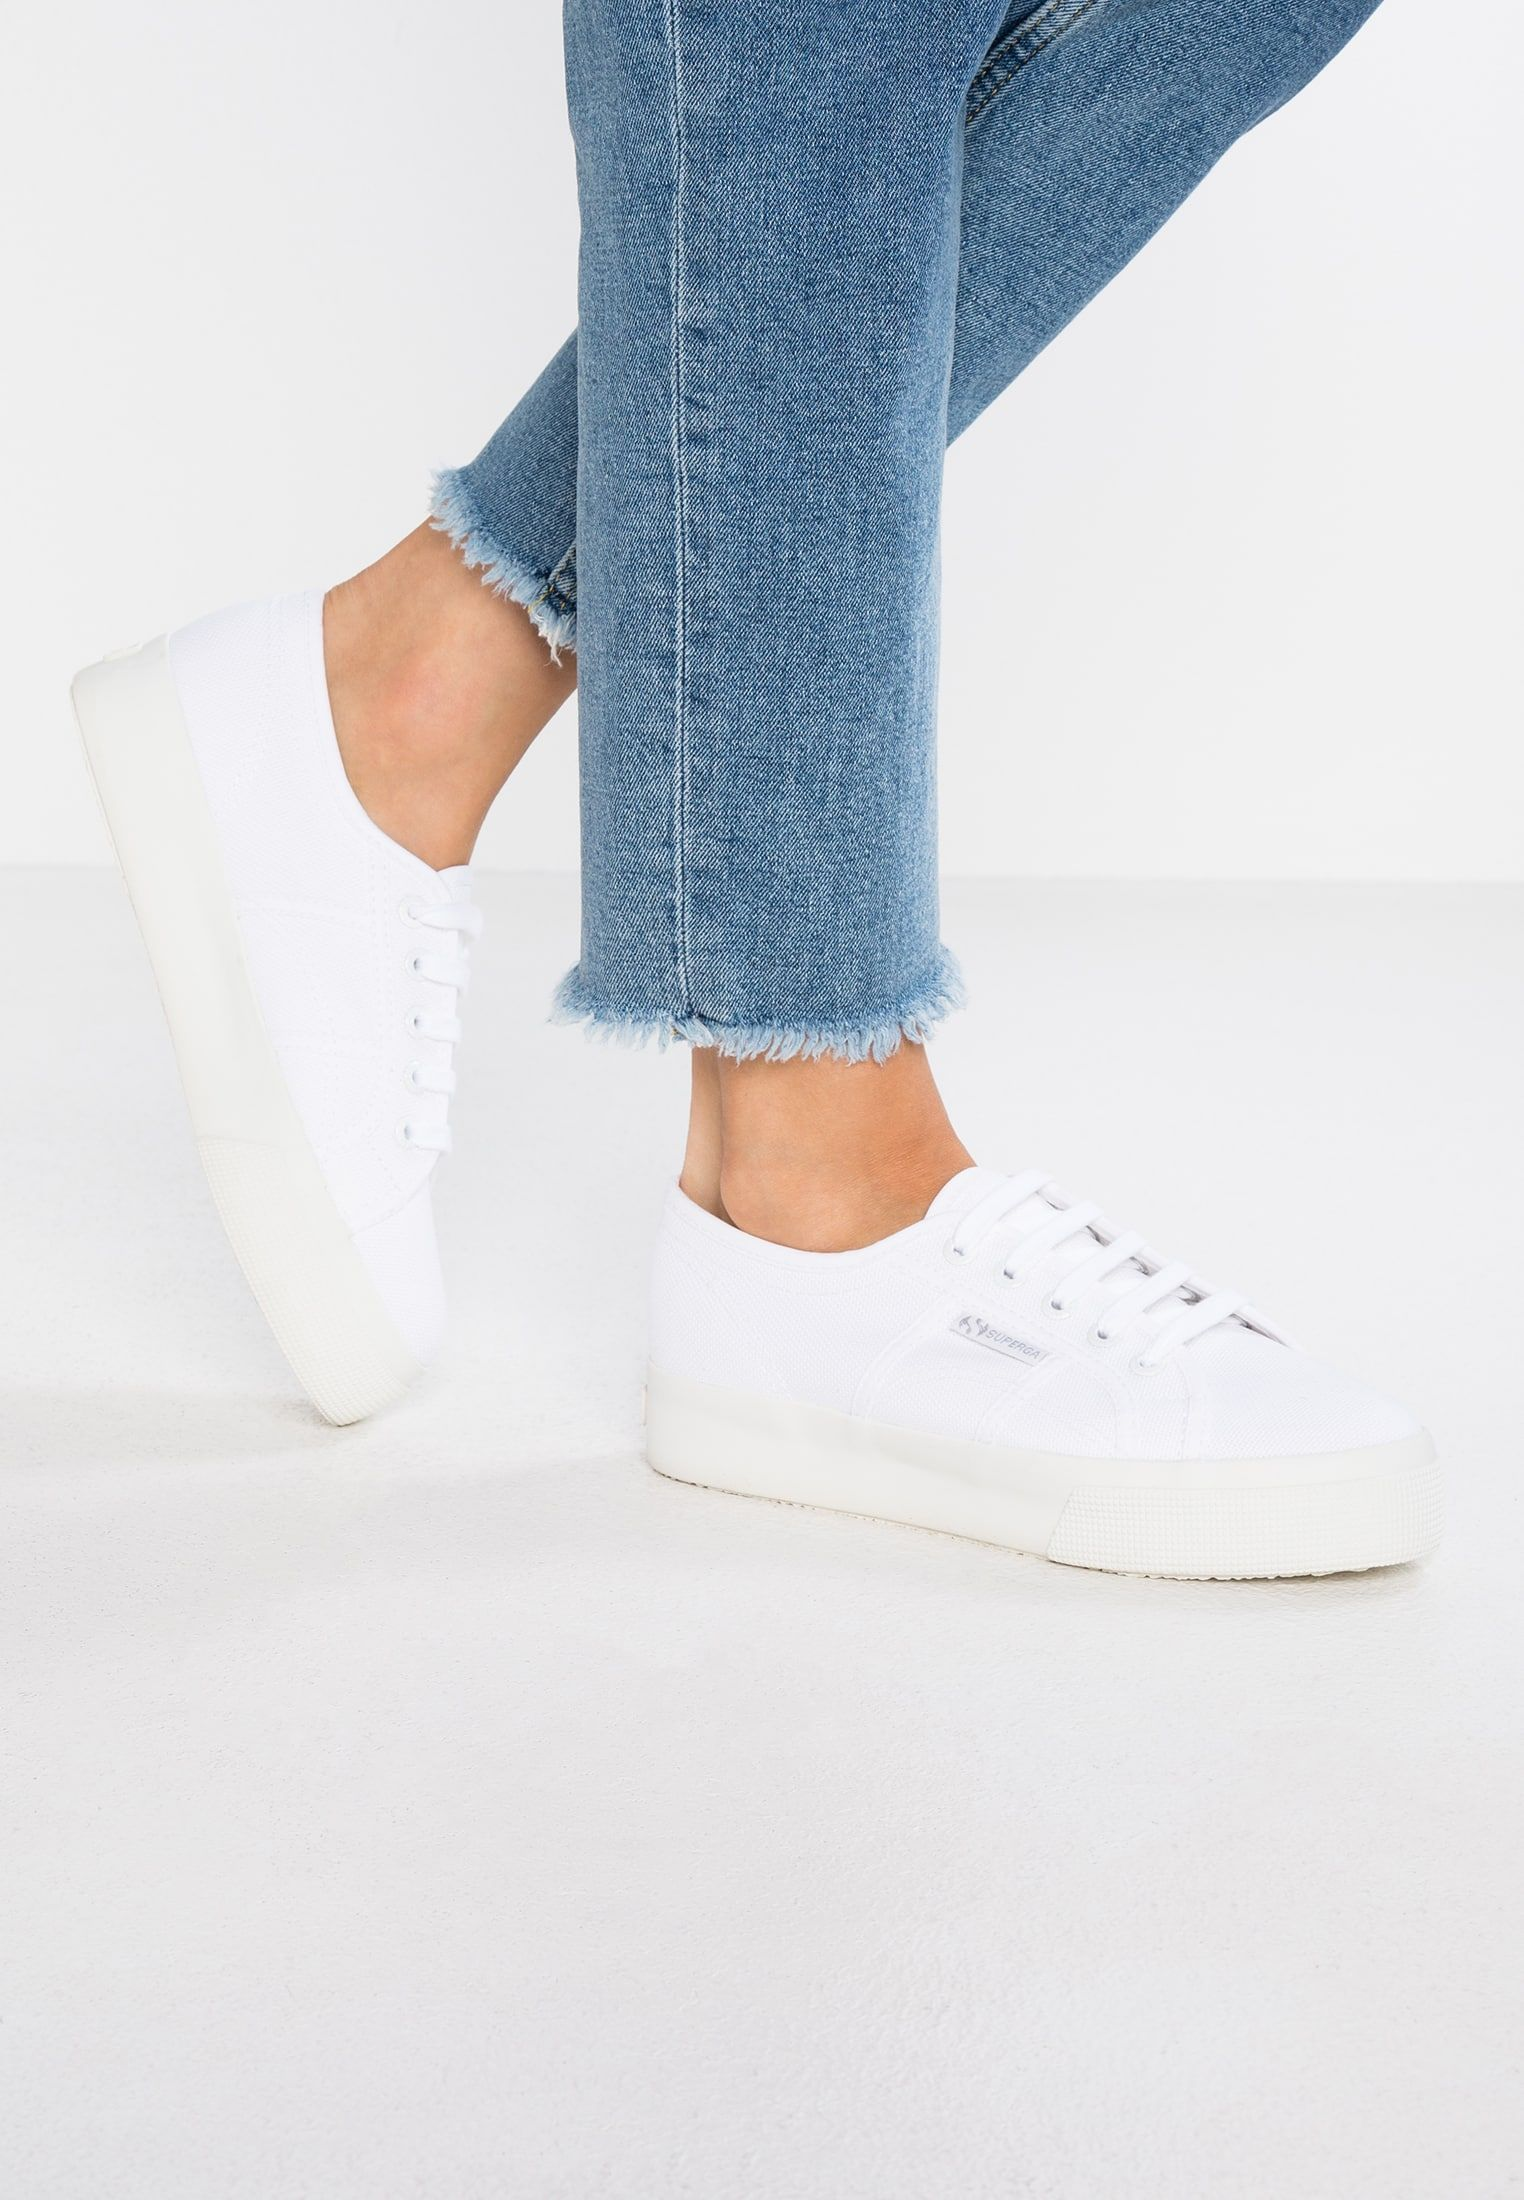 quality design 8abbf 0a594 Superga 2730 - Sneakers - total white - Zalando.se